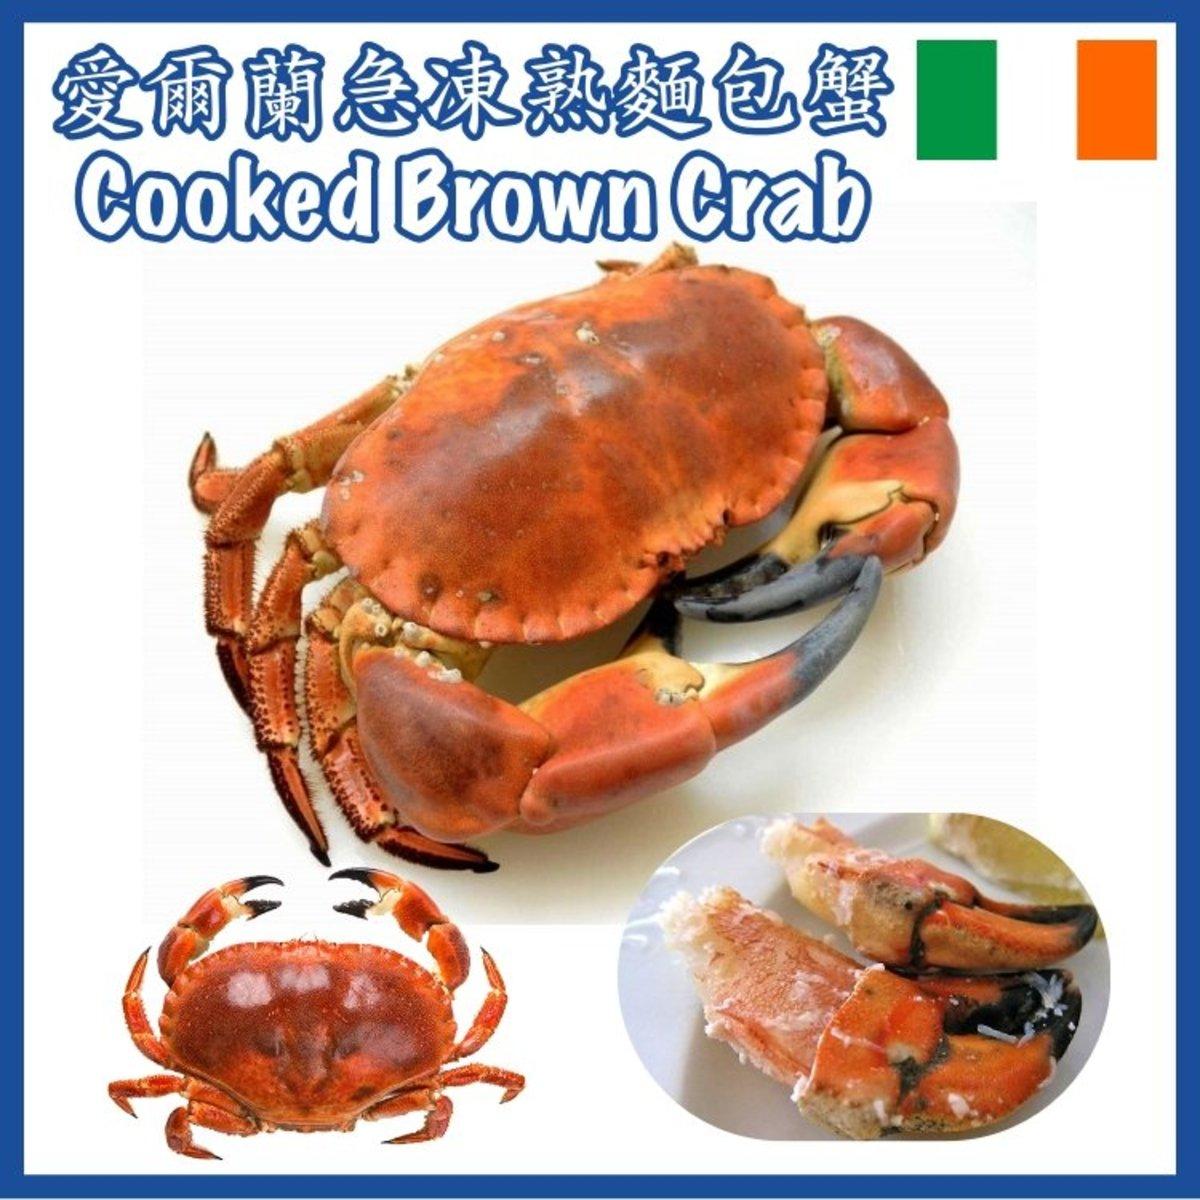 Ireland Frozen Cooked Brown Crab, 400-600g/pc